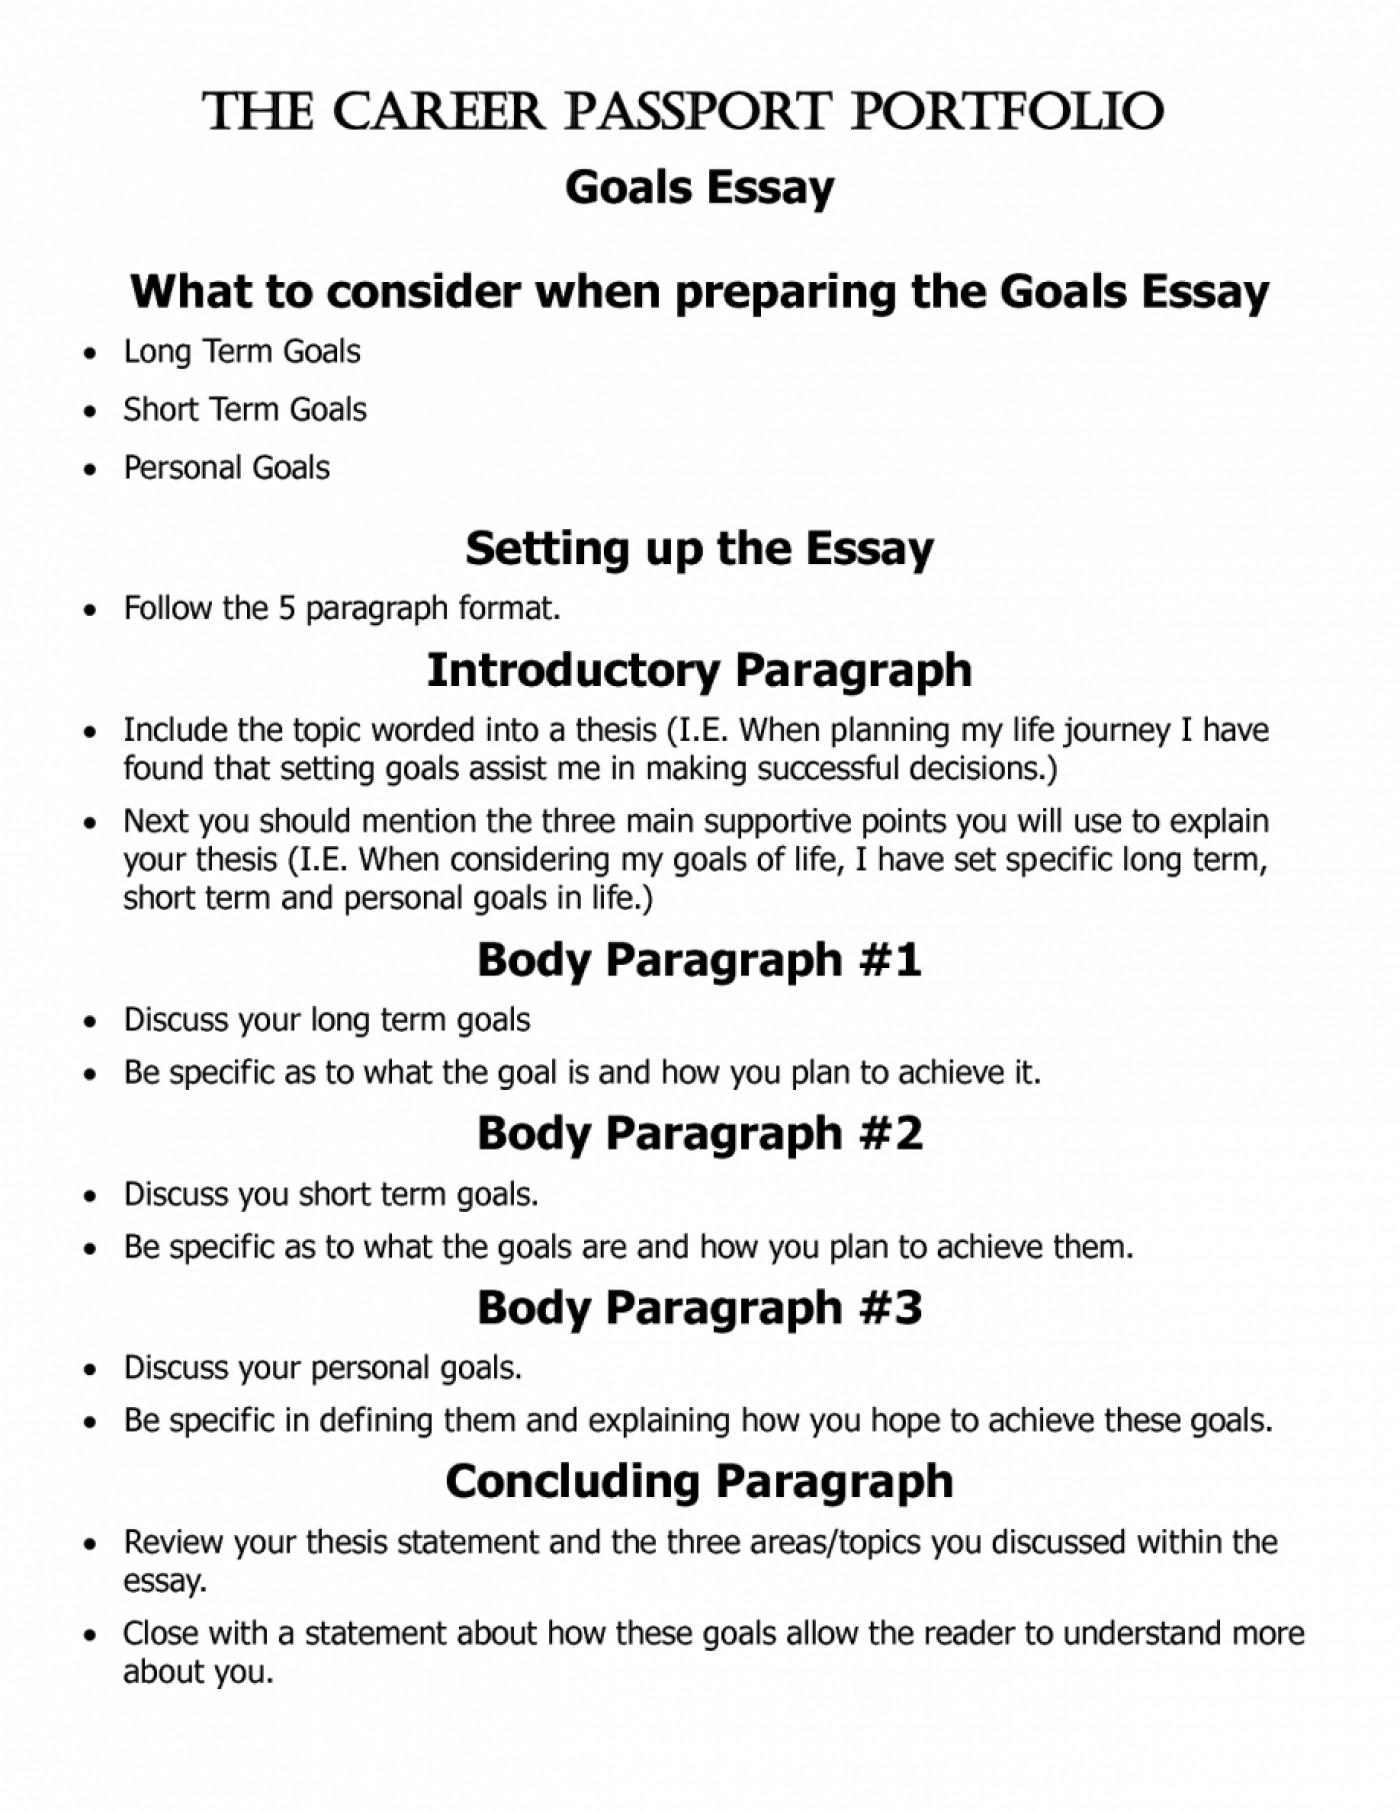 Pay someone to write my grad school essays